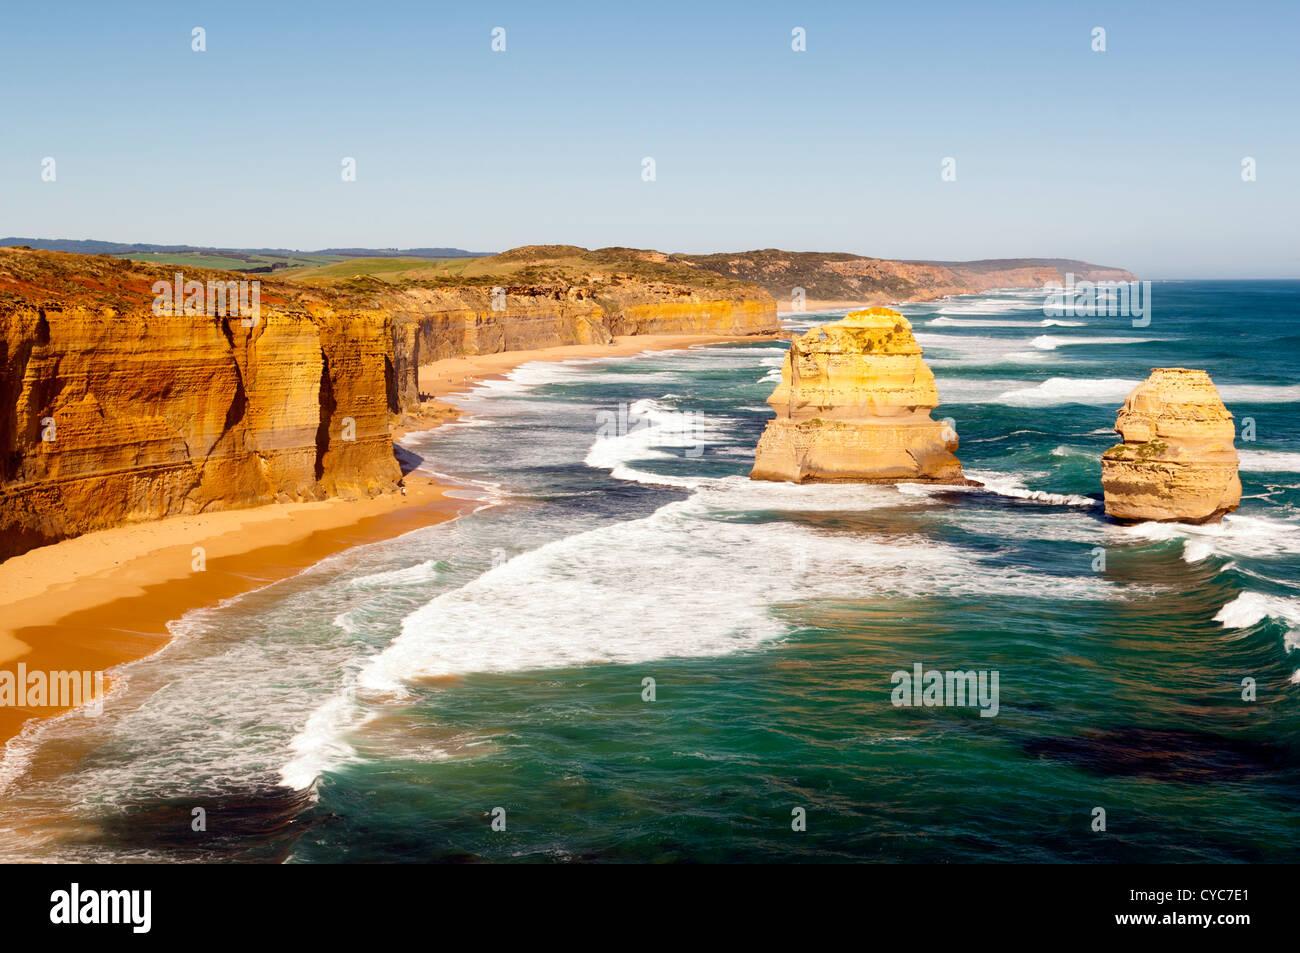 Twelve Apostles, famous landmark along the Great Ocean Road, Australia - Stock Image